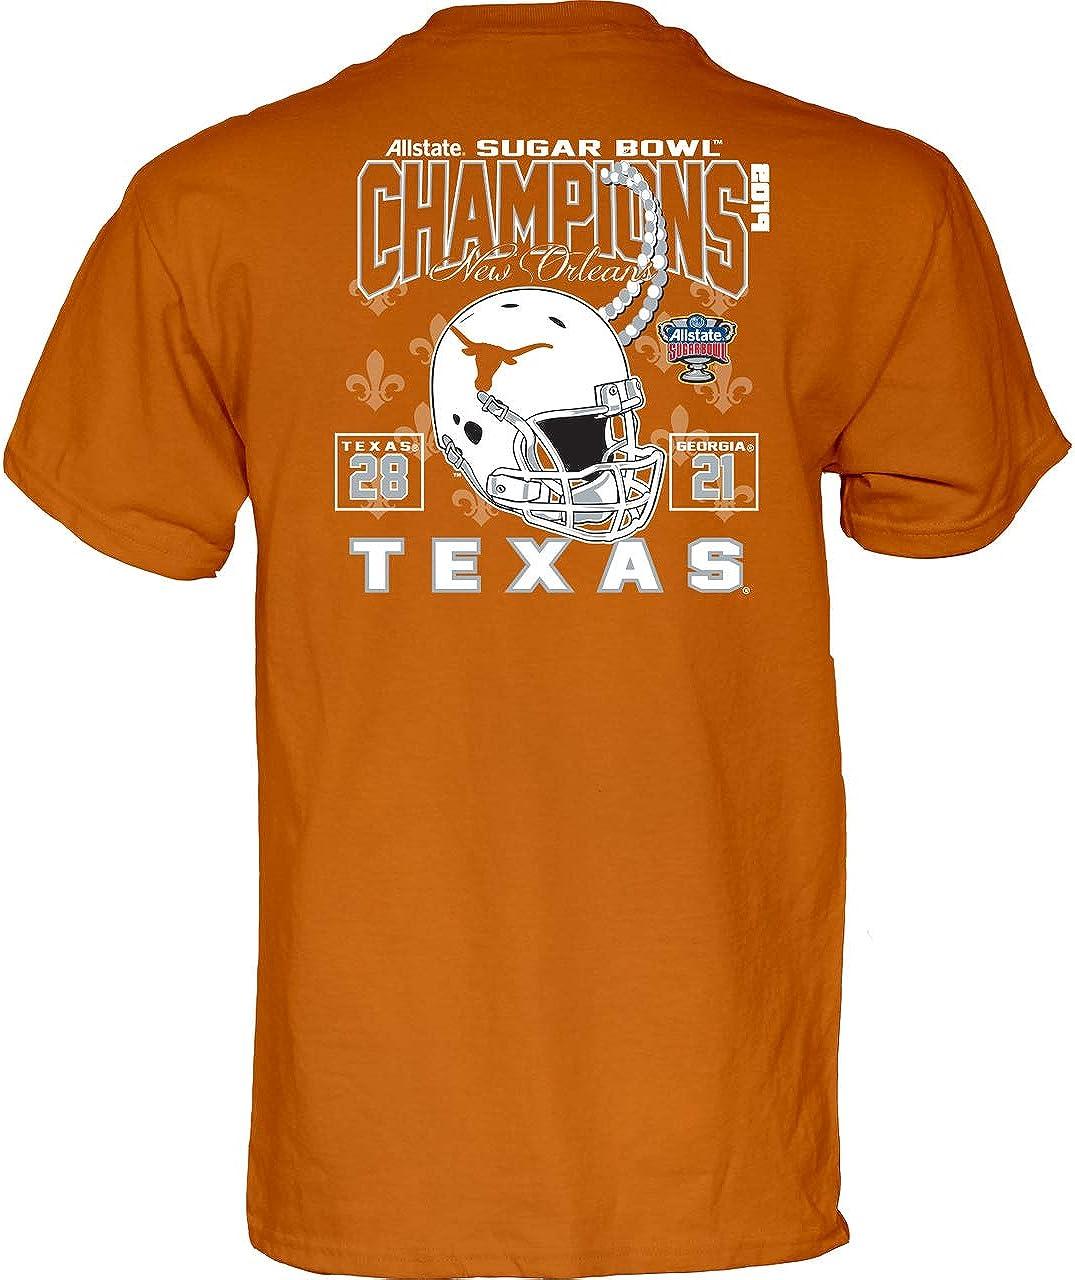 Amazon.com : UT University of Texas Longhorn 2018 Sugar Bowl Champions Tee  (Burnt Orange, S) : Clothing